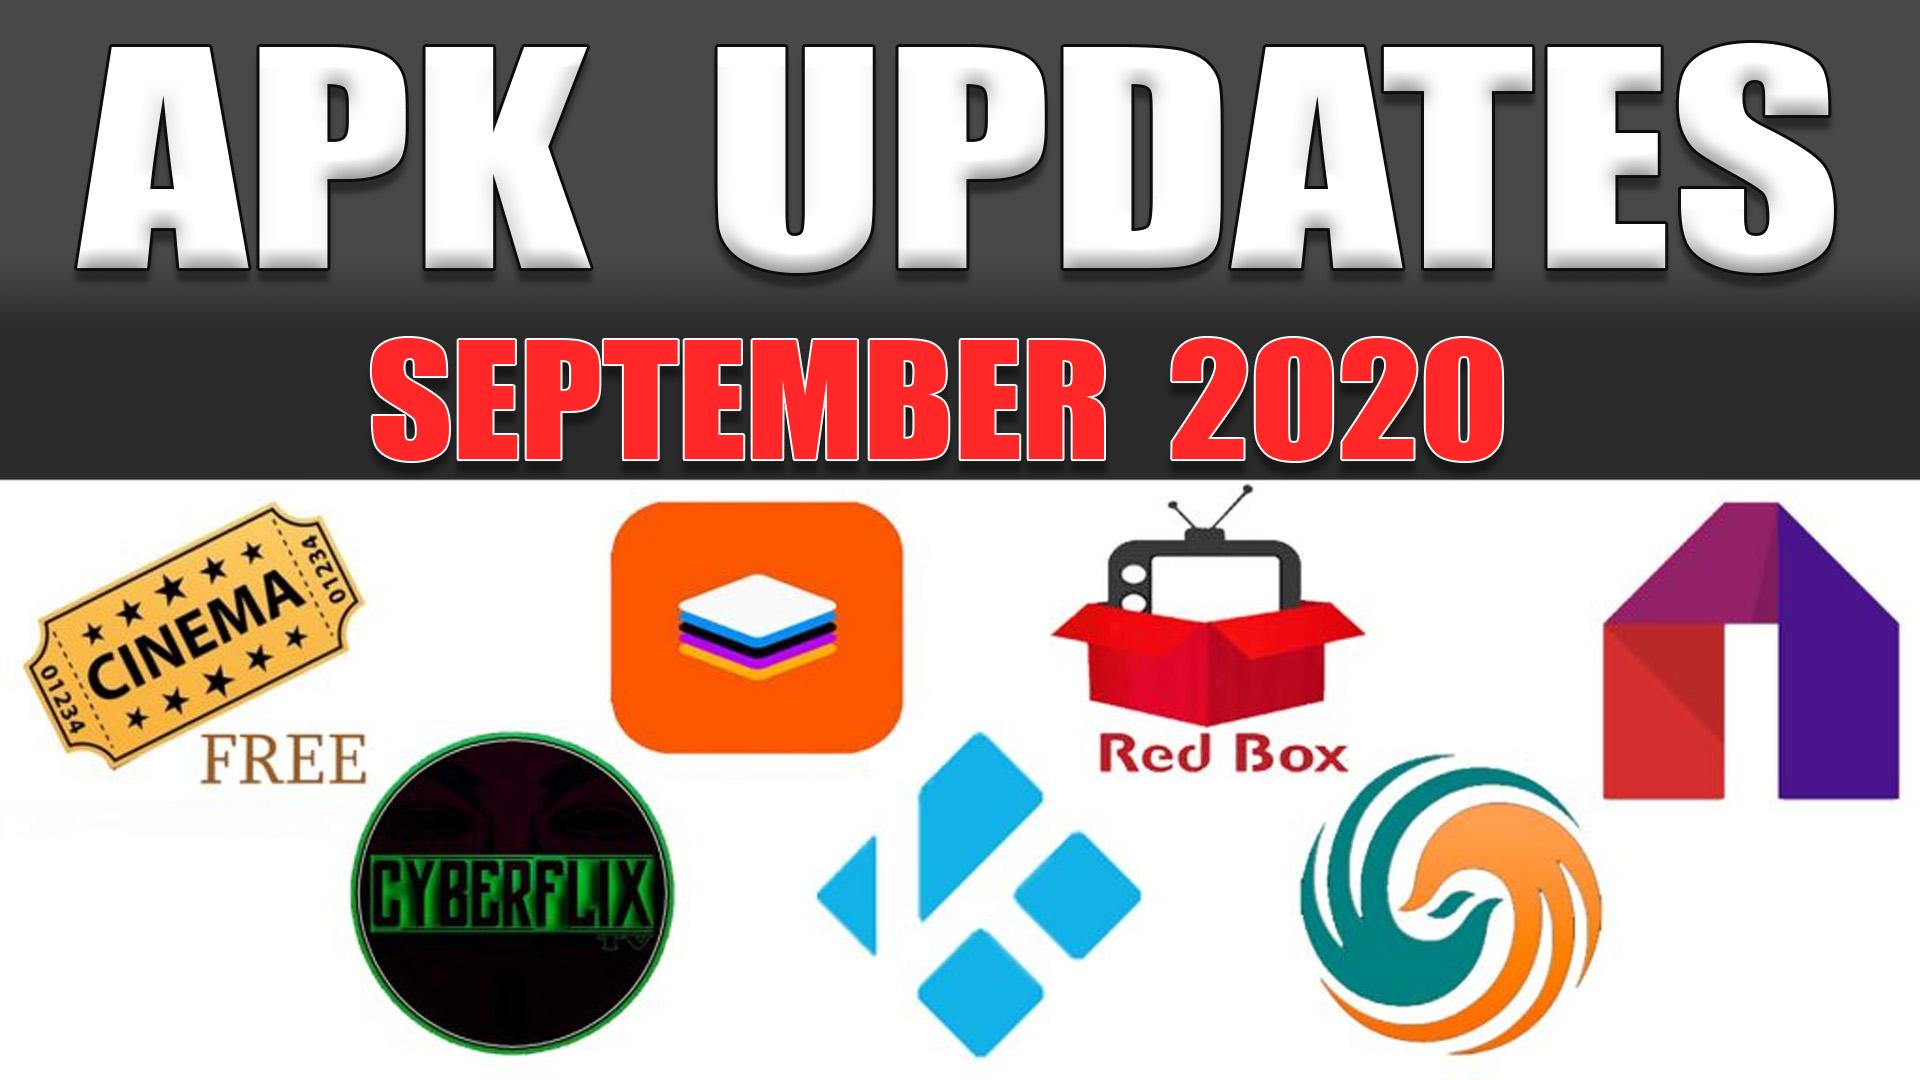 APK Updates September 2020